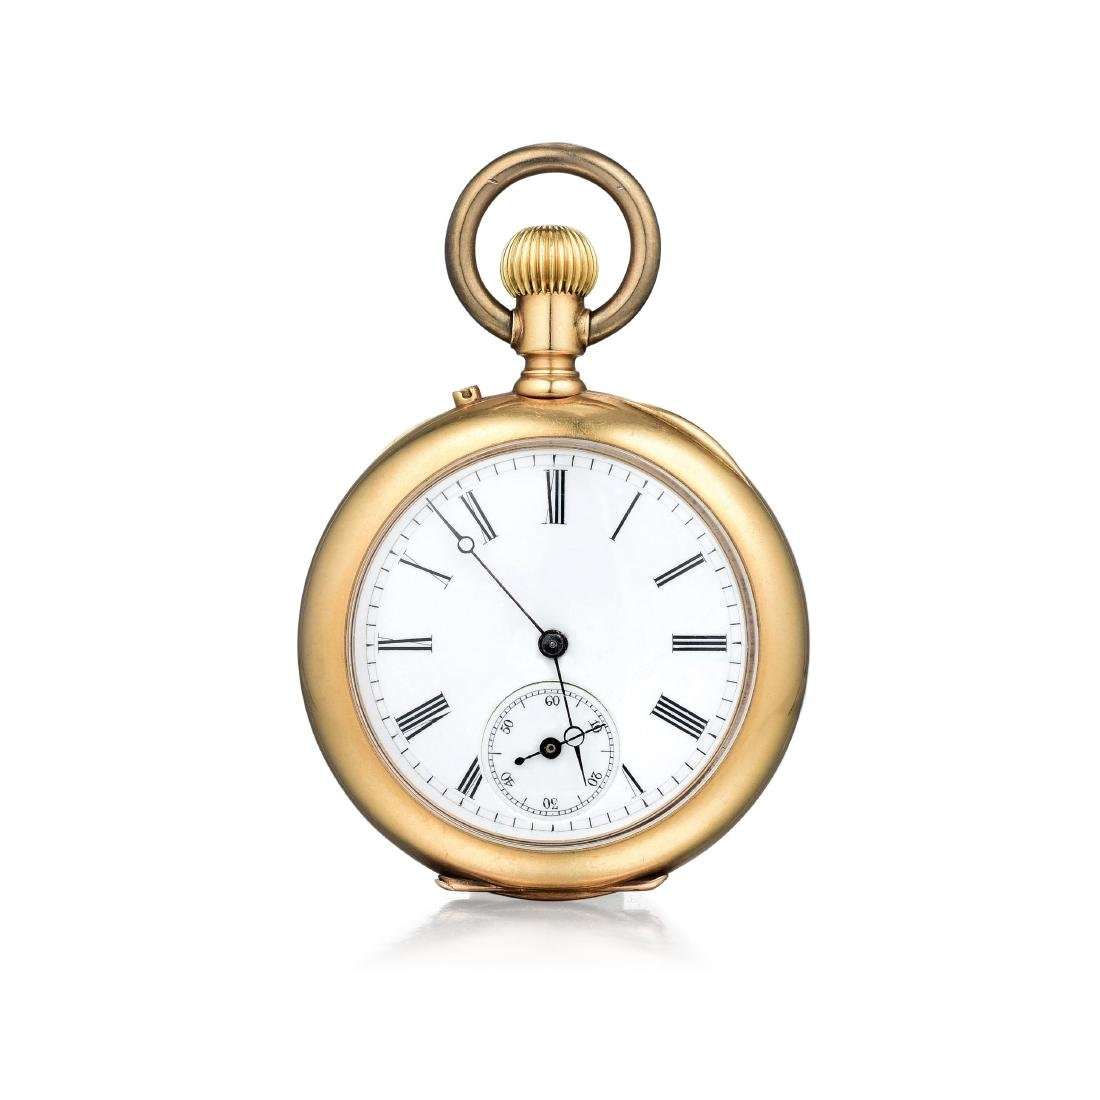 TB Starr Pocket Watch